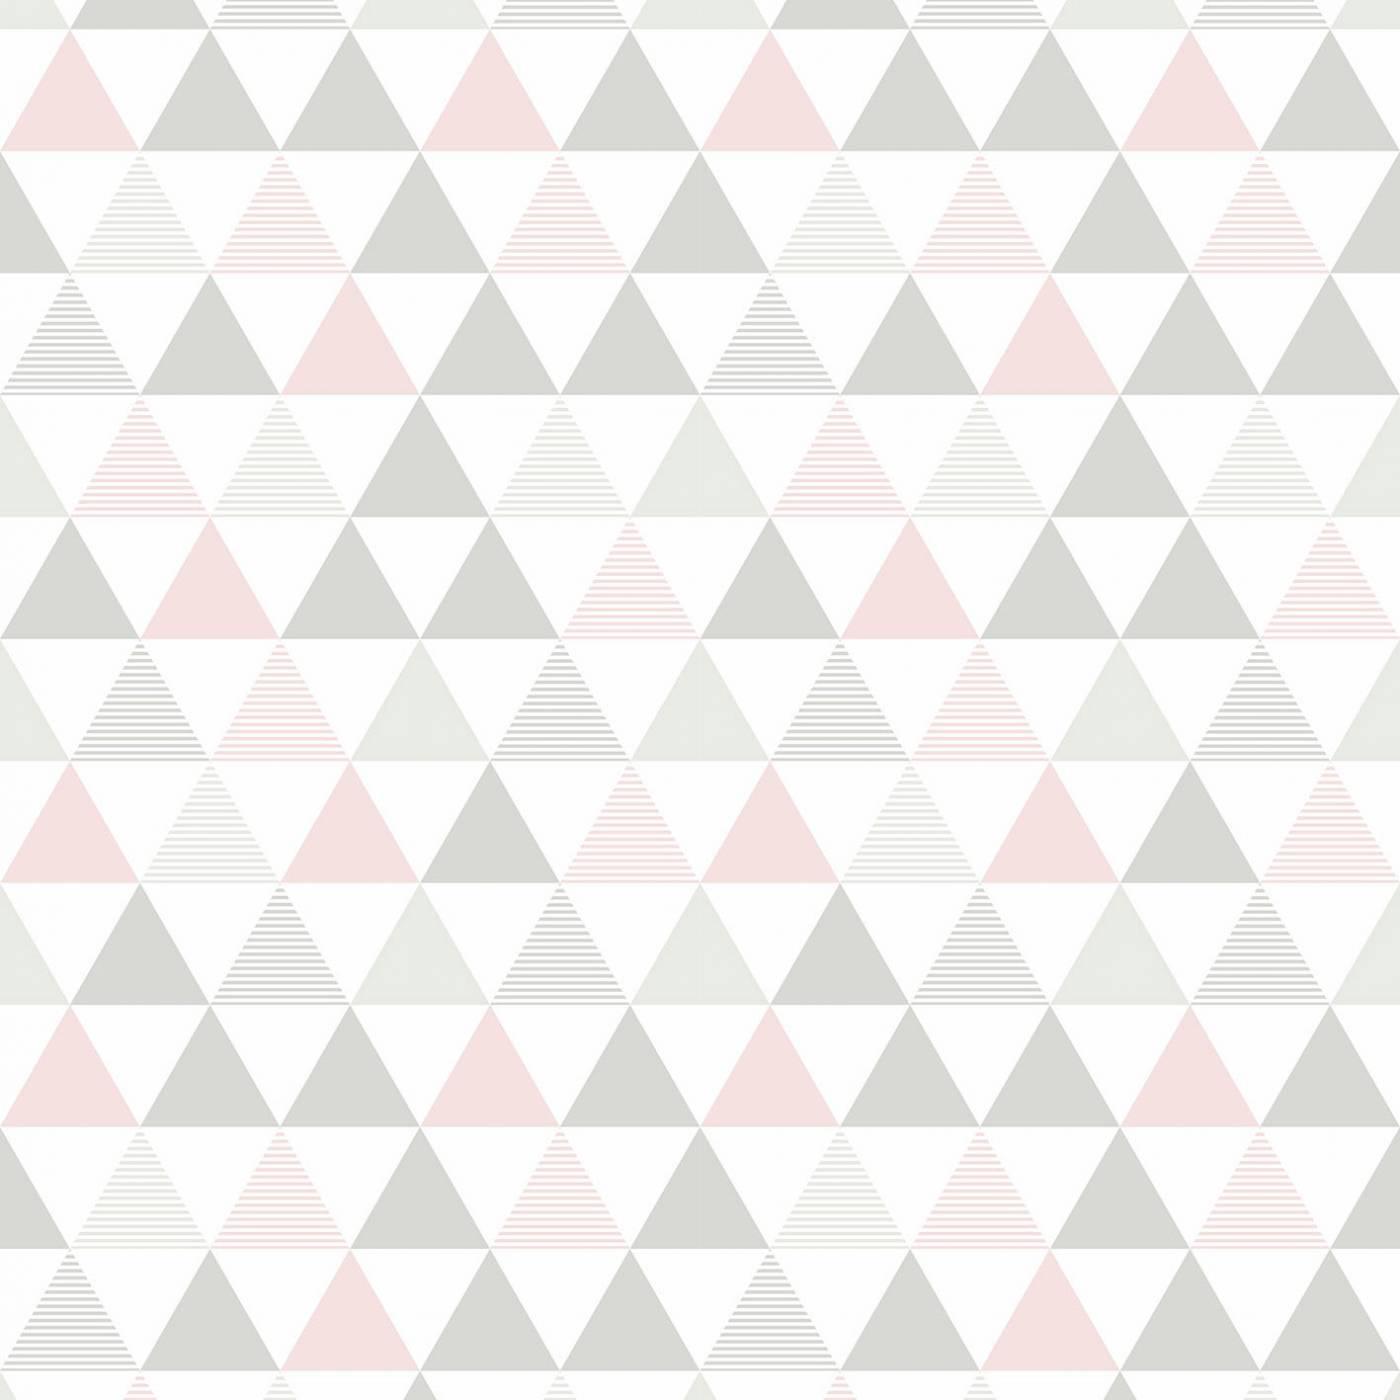 Papel de Parede Triangulo Cinza e Rosa